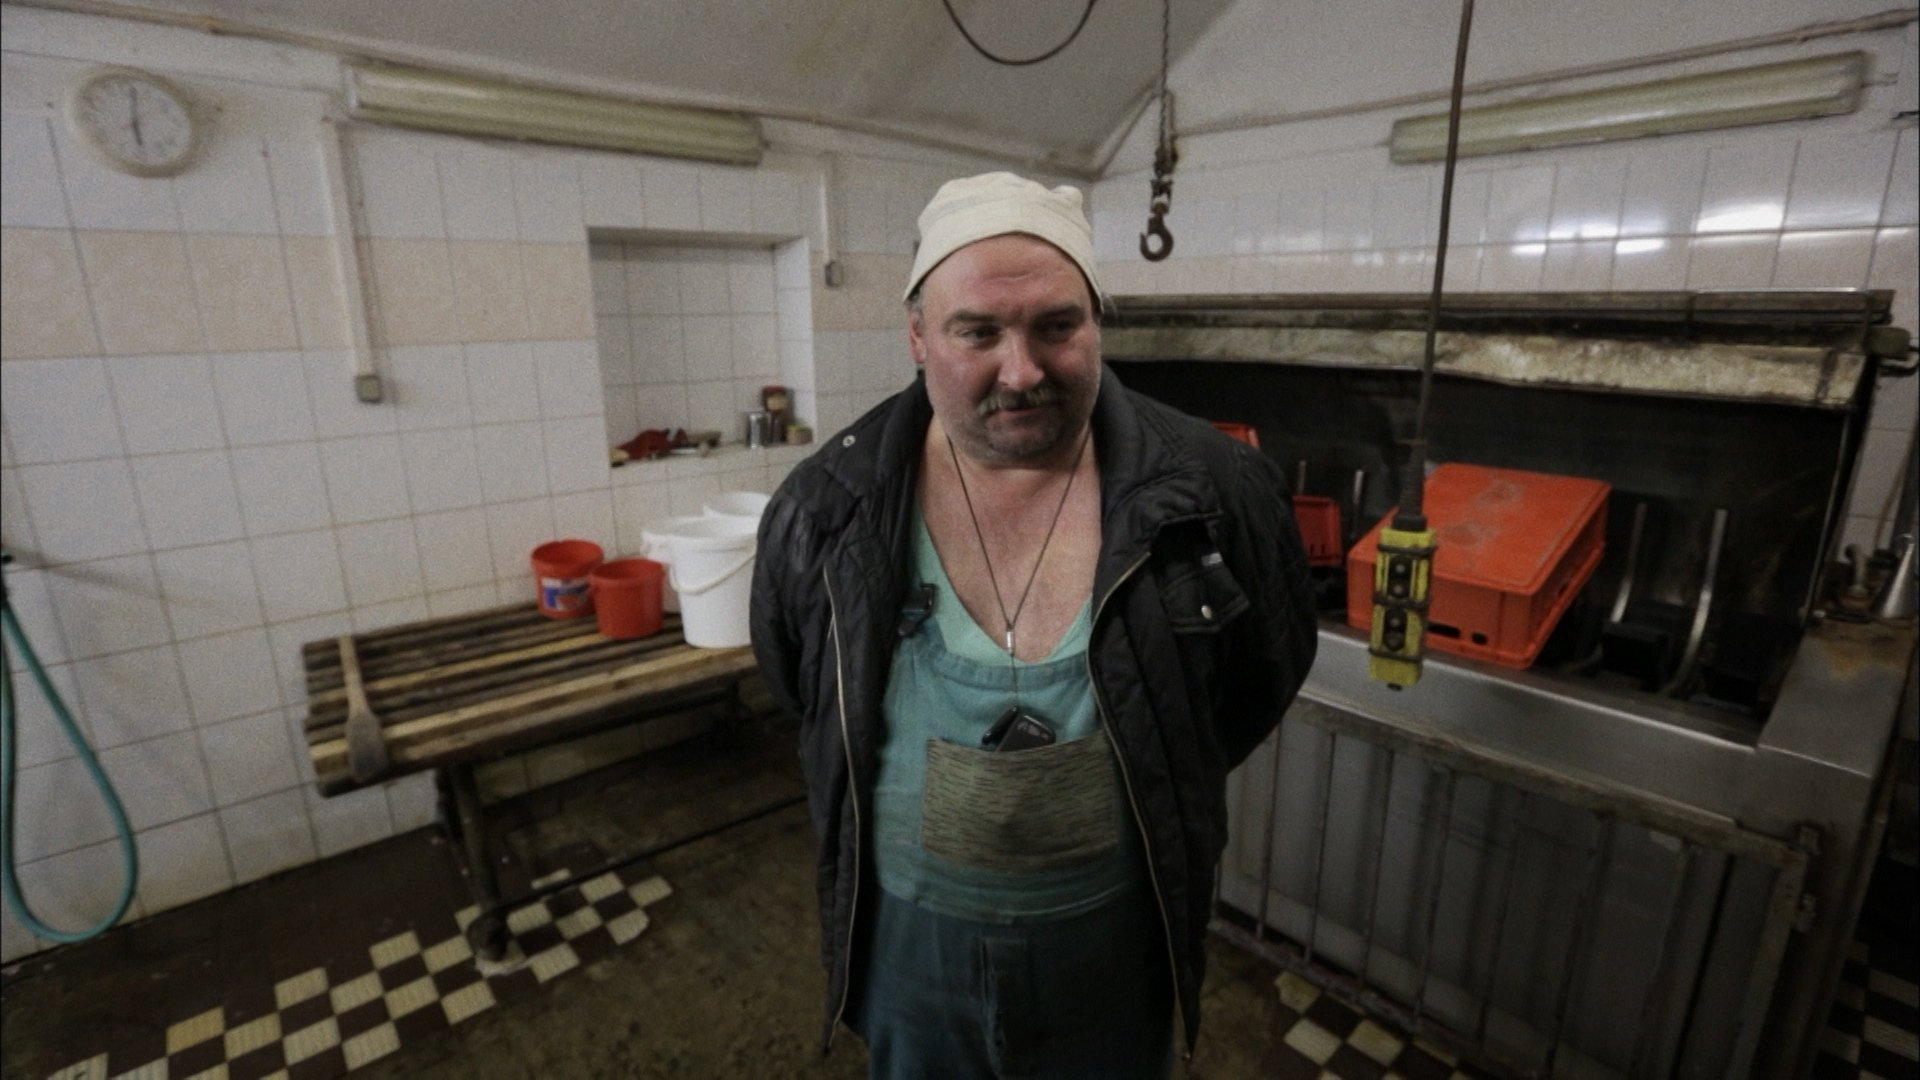 ceska-pivni-valka_lada-pc_r8634.jpg